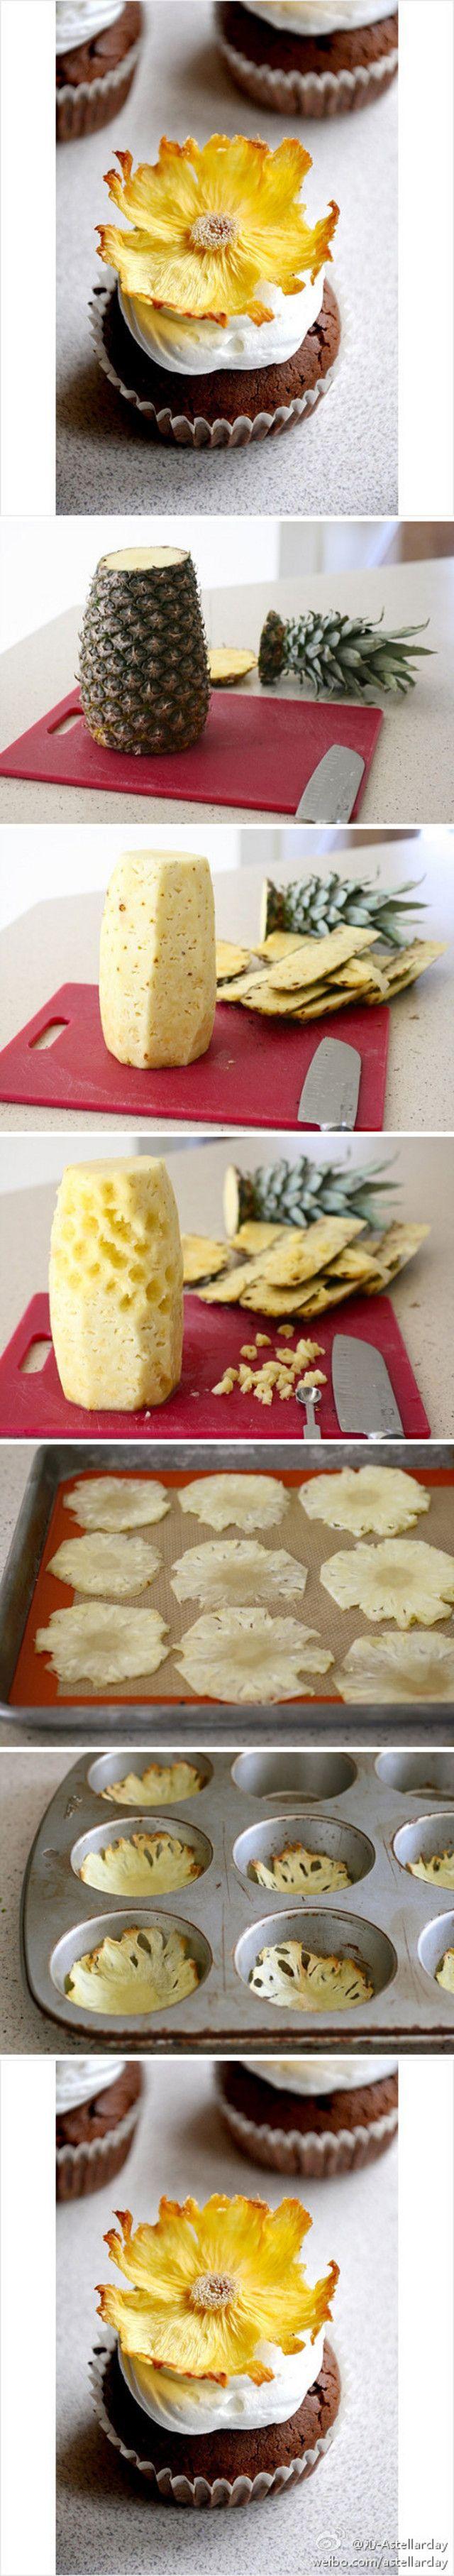 Dried pineapple flower - Cooking Forum - GardenWeb. wwwoooowwww